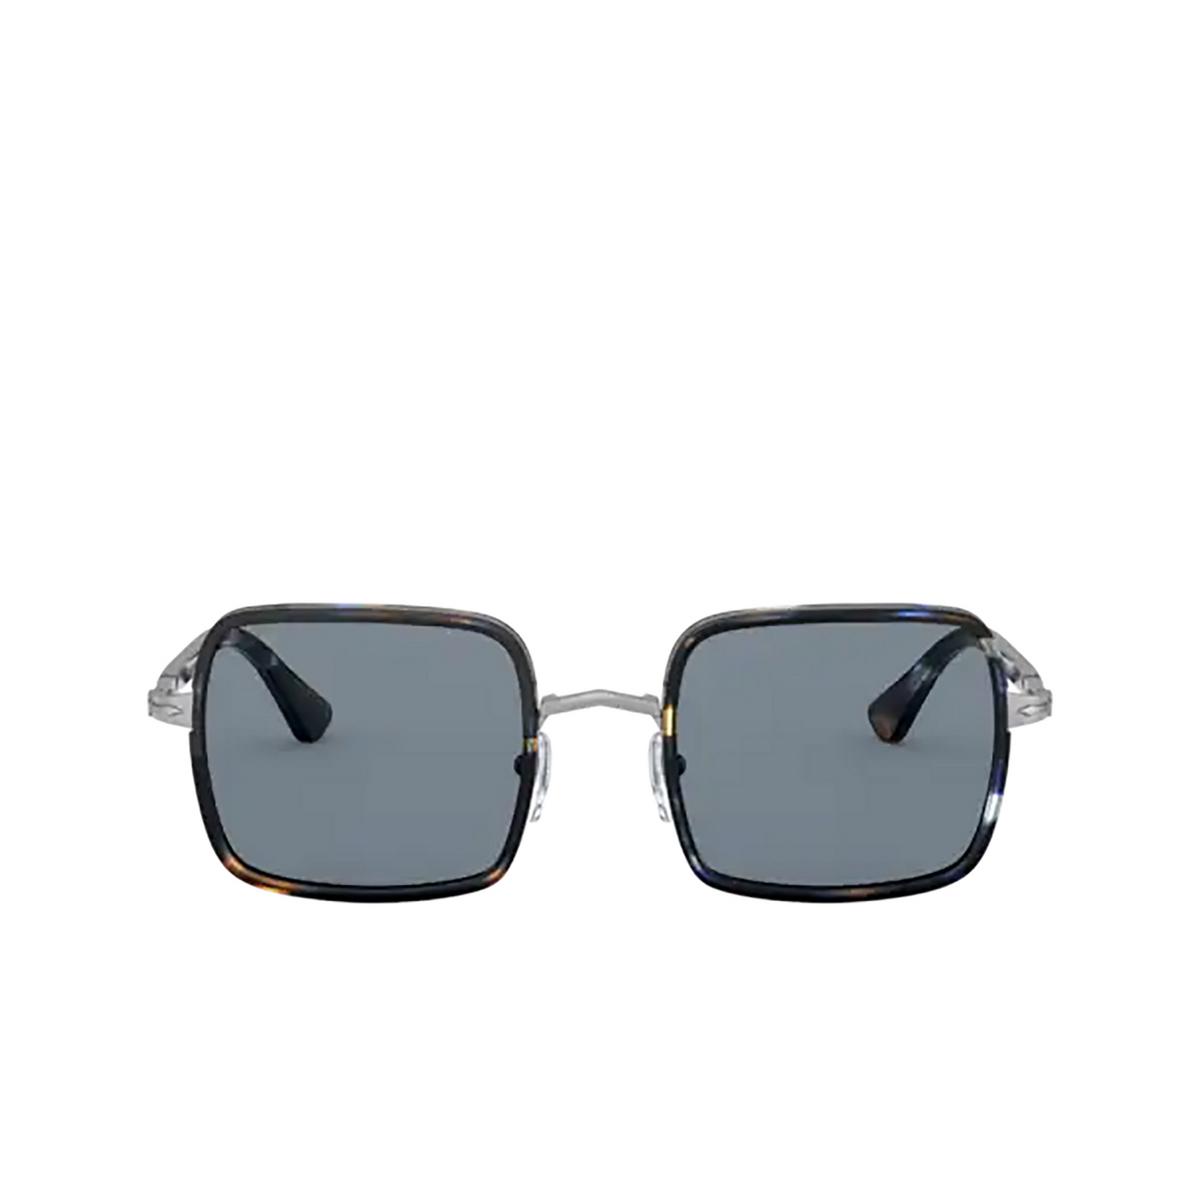 Persol® Square Sunglasses: PO2475S color Gunmetal & Blue Grid 109956 - front view.